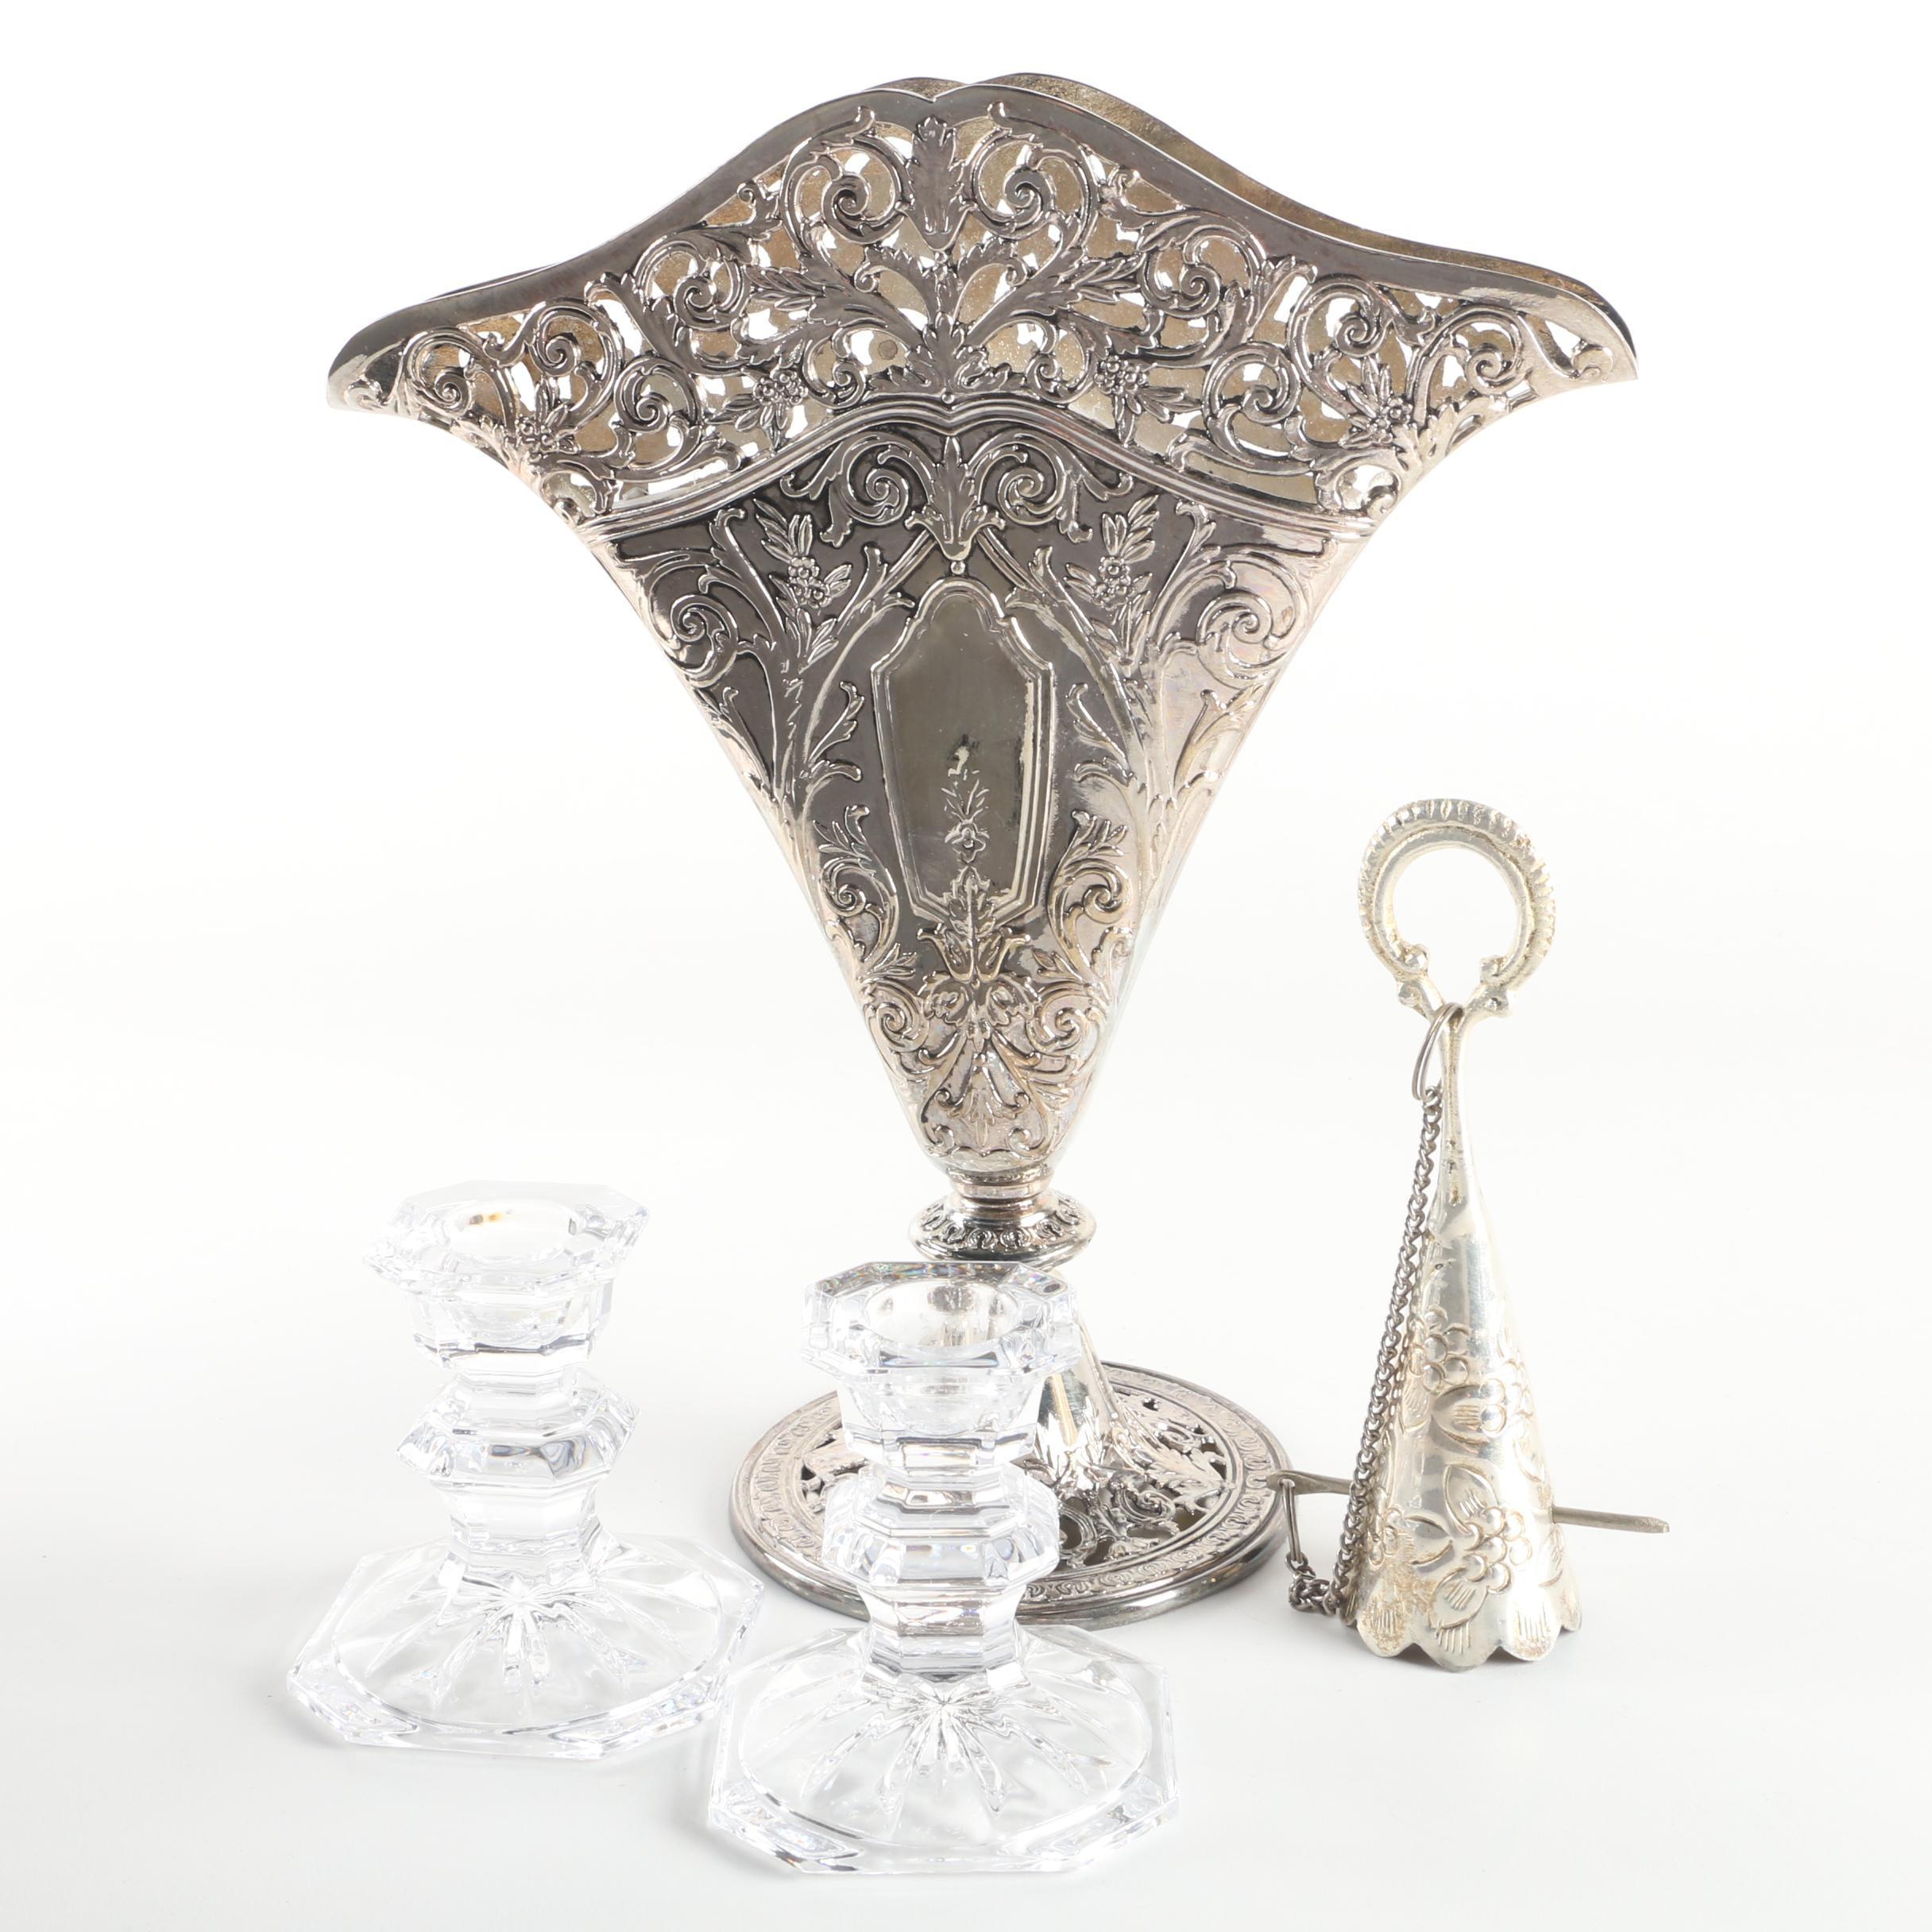 Godinger Art Nouveau Style Silver Plate Fan Vase with Crystal Candleholders